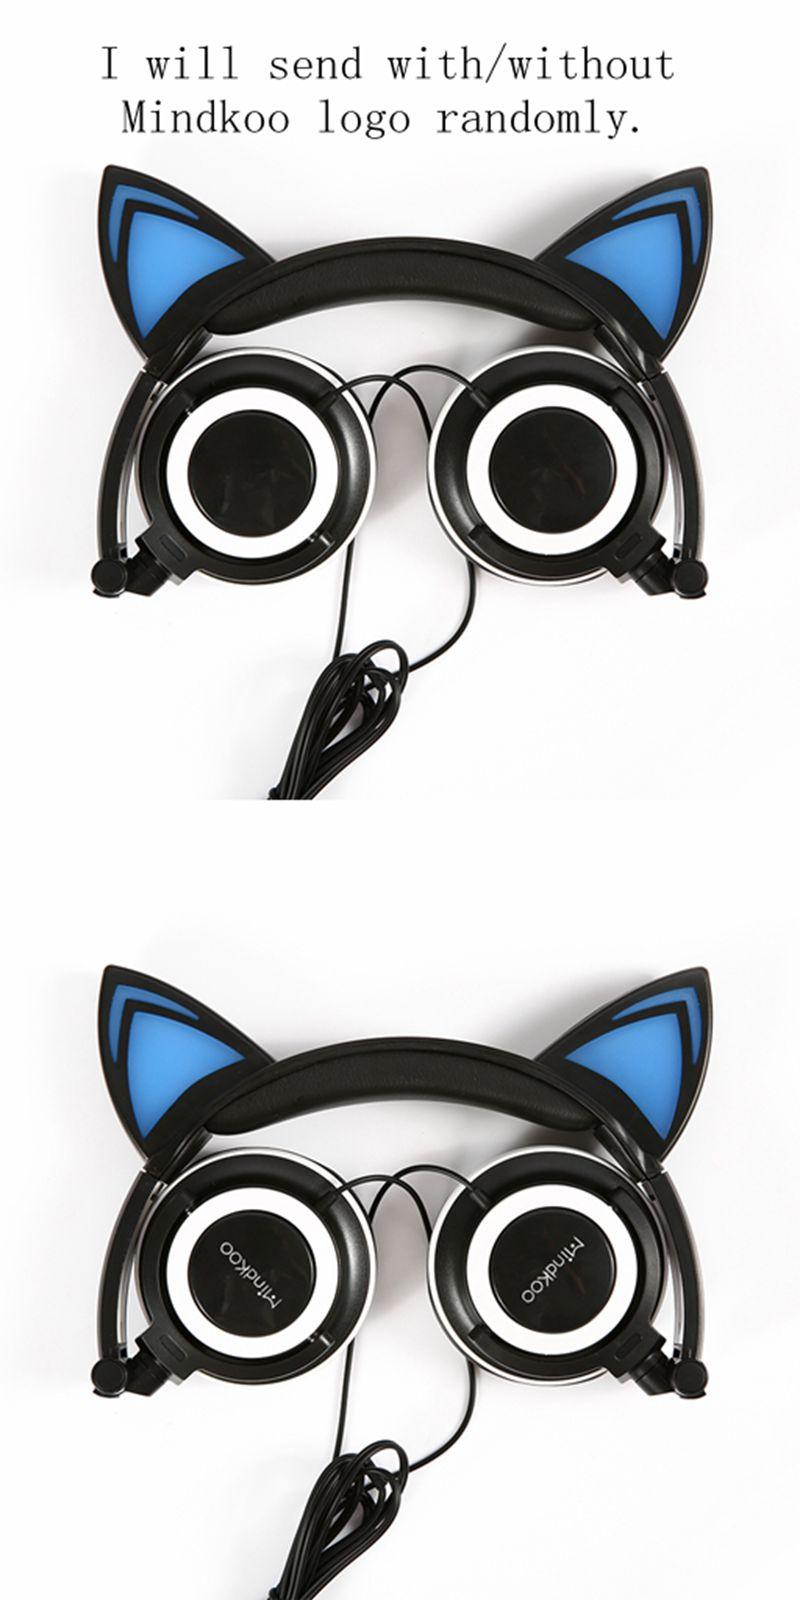 HTB1jYk0PVXXXXctXFXXq6xXFXXXX - Mindkoo Stylish Cat Ear Headphones with LED light